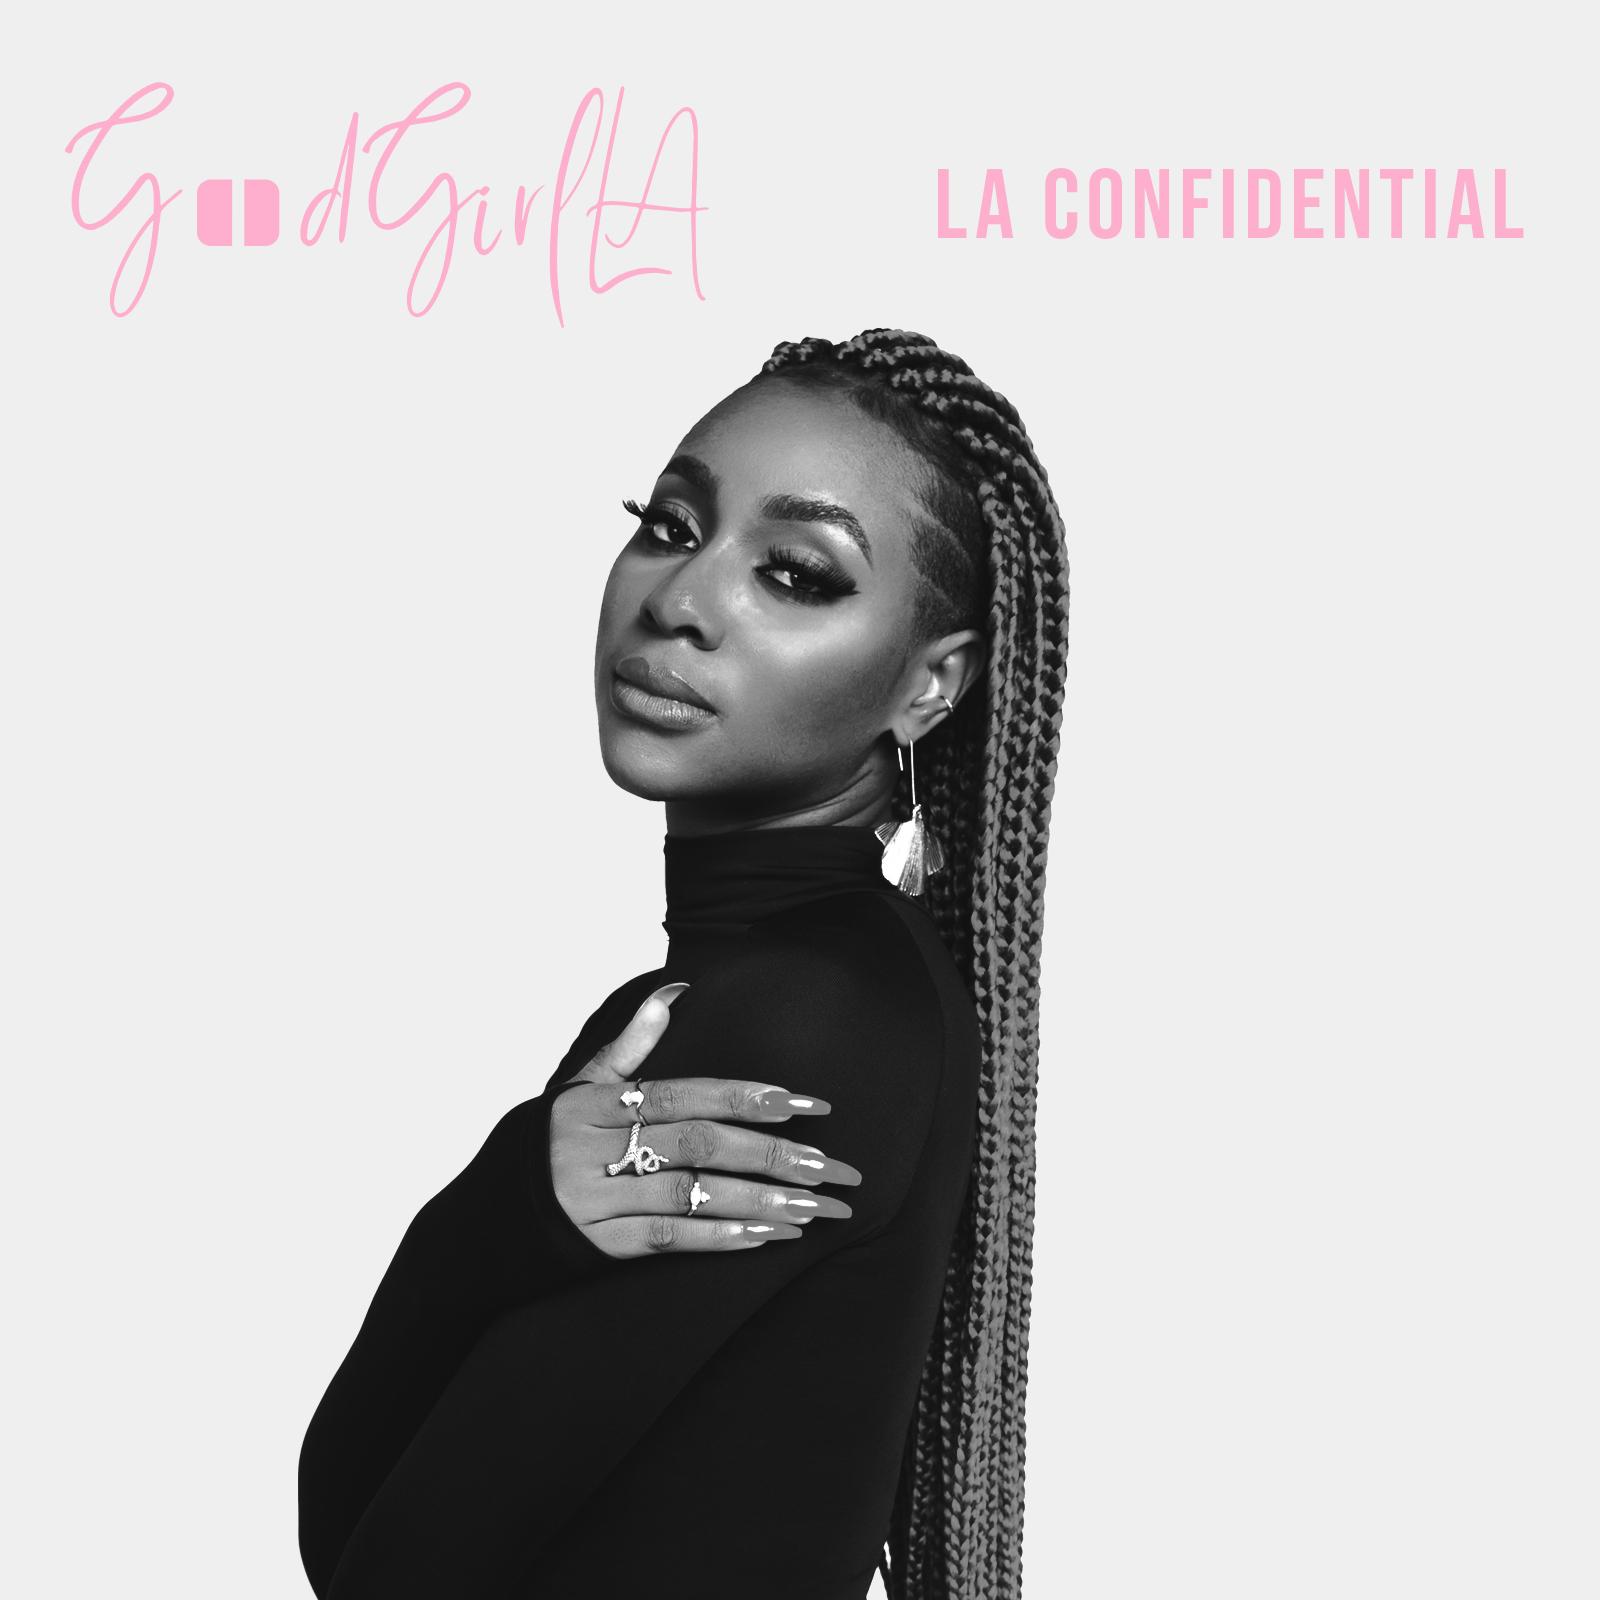 GoodGirl LA